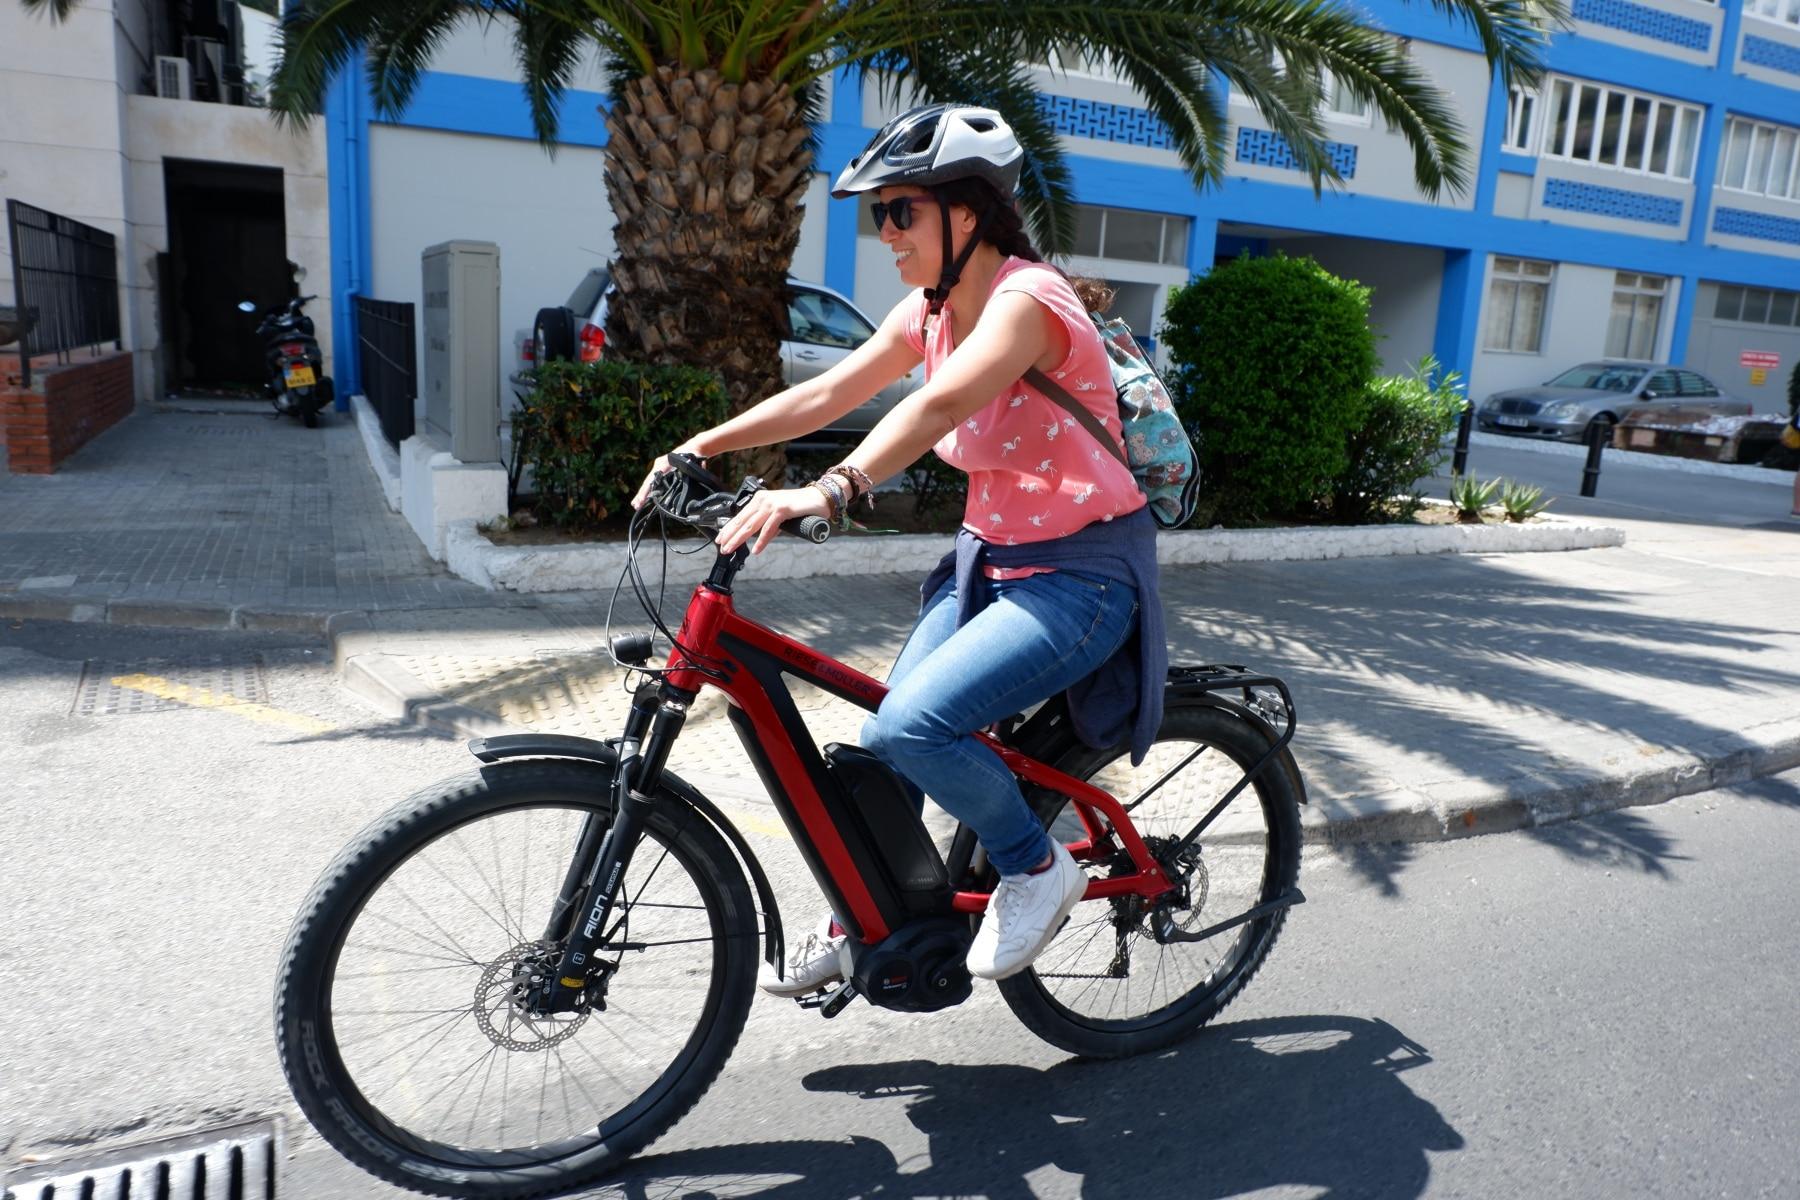 23-jun-2019-blogueros-espaoles-de-viajes-visitan-el-pen_48131157062_o